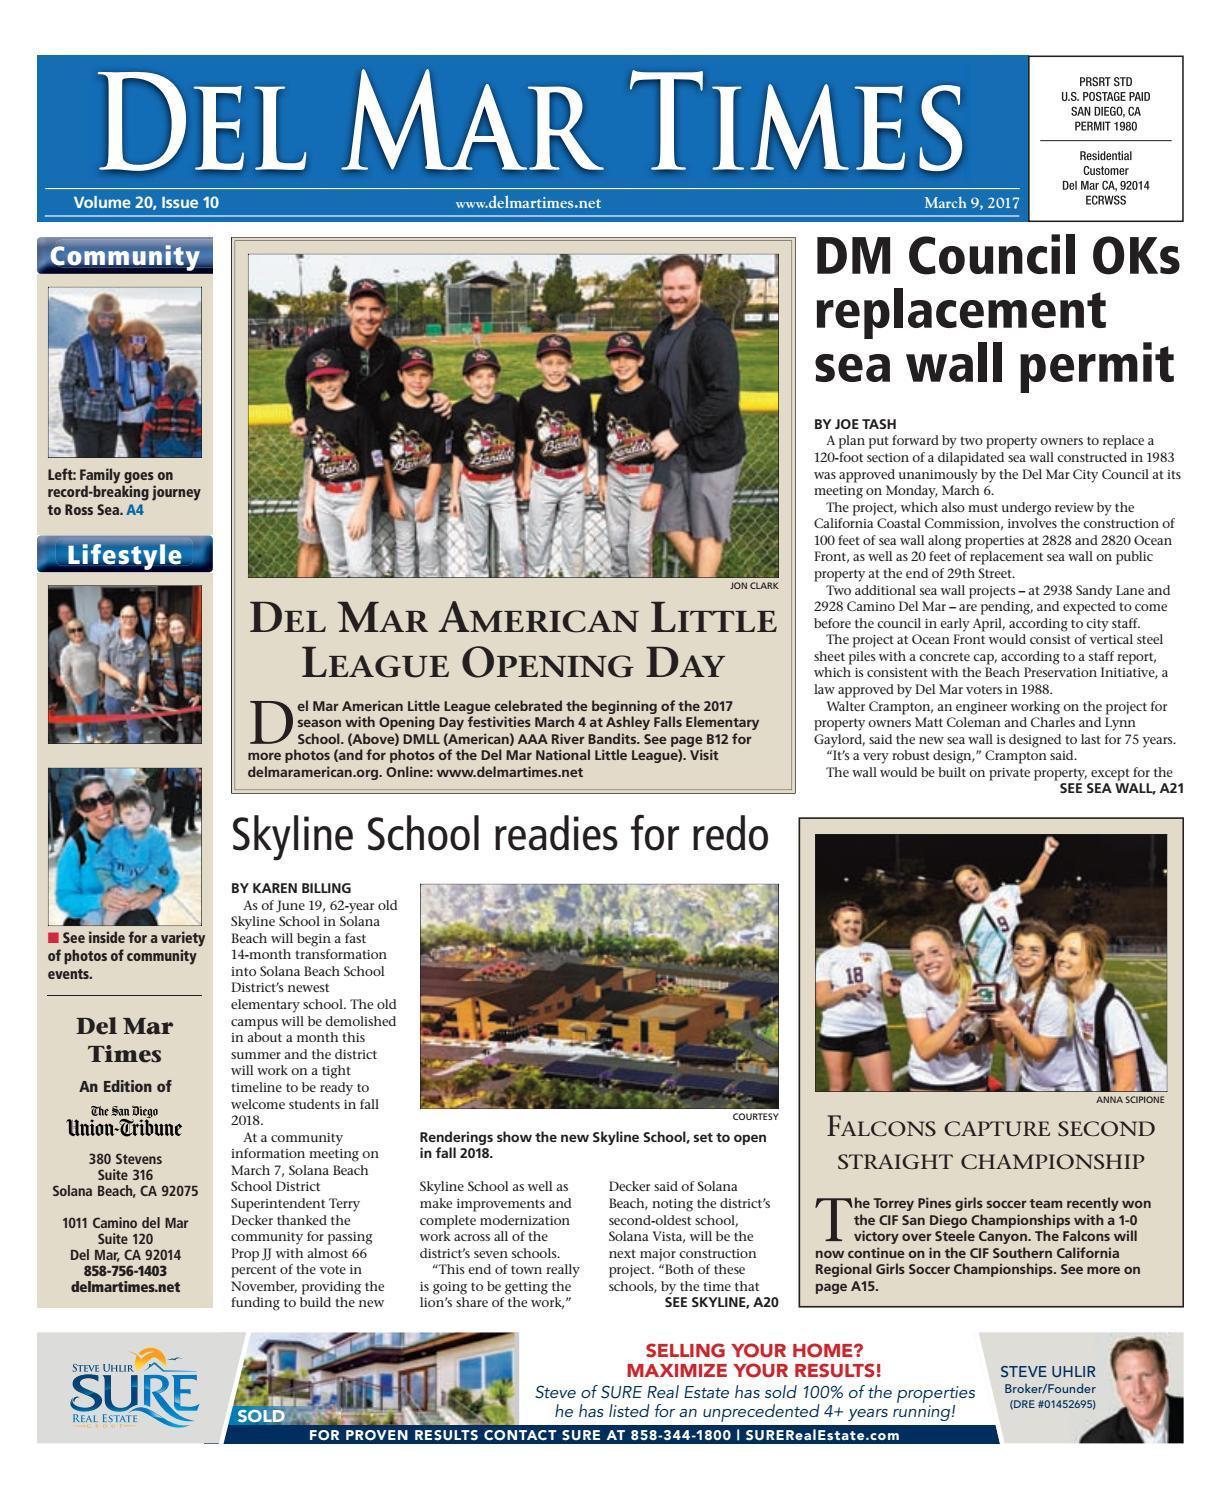 Del mar times 03 09 17 by MainStreet Media - issuu